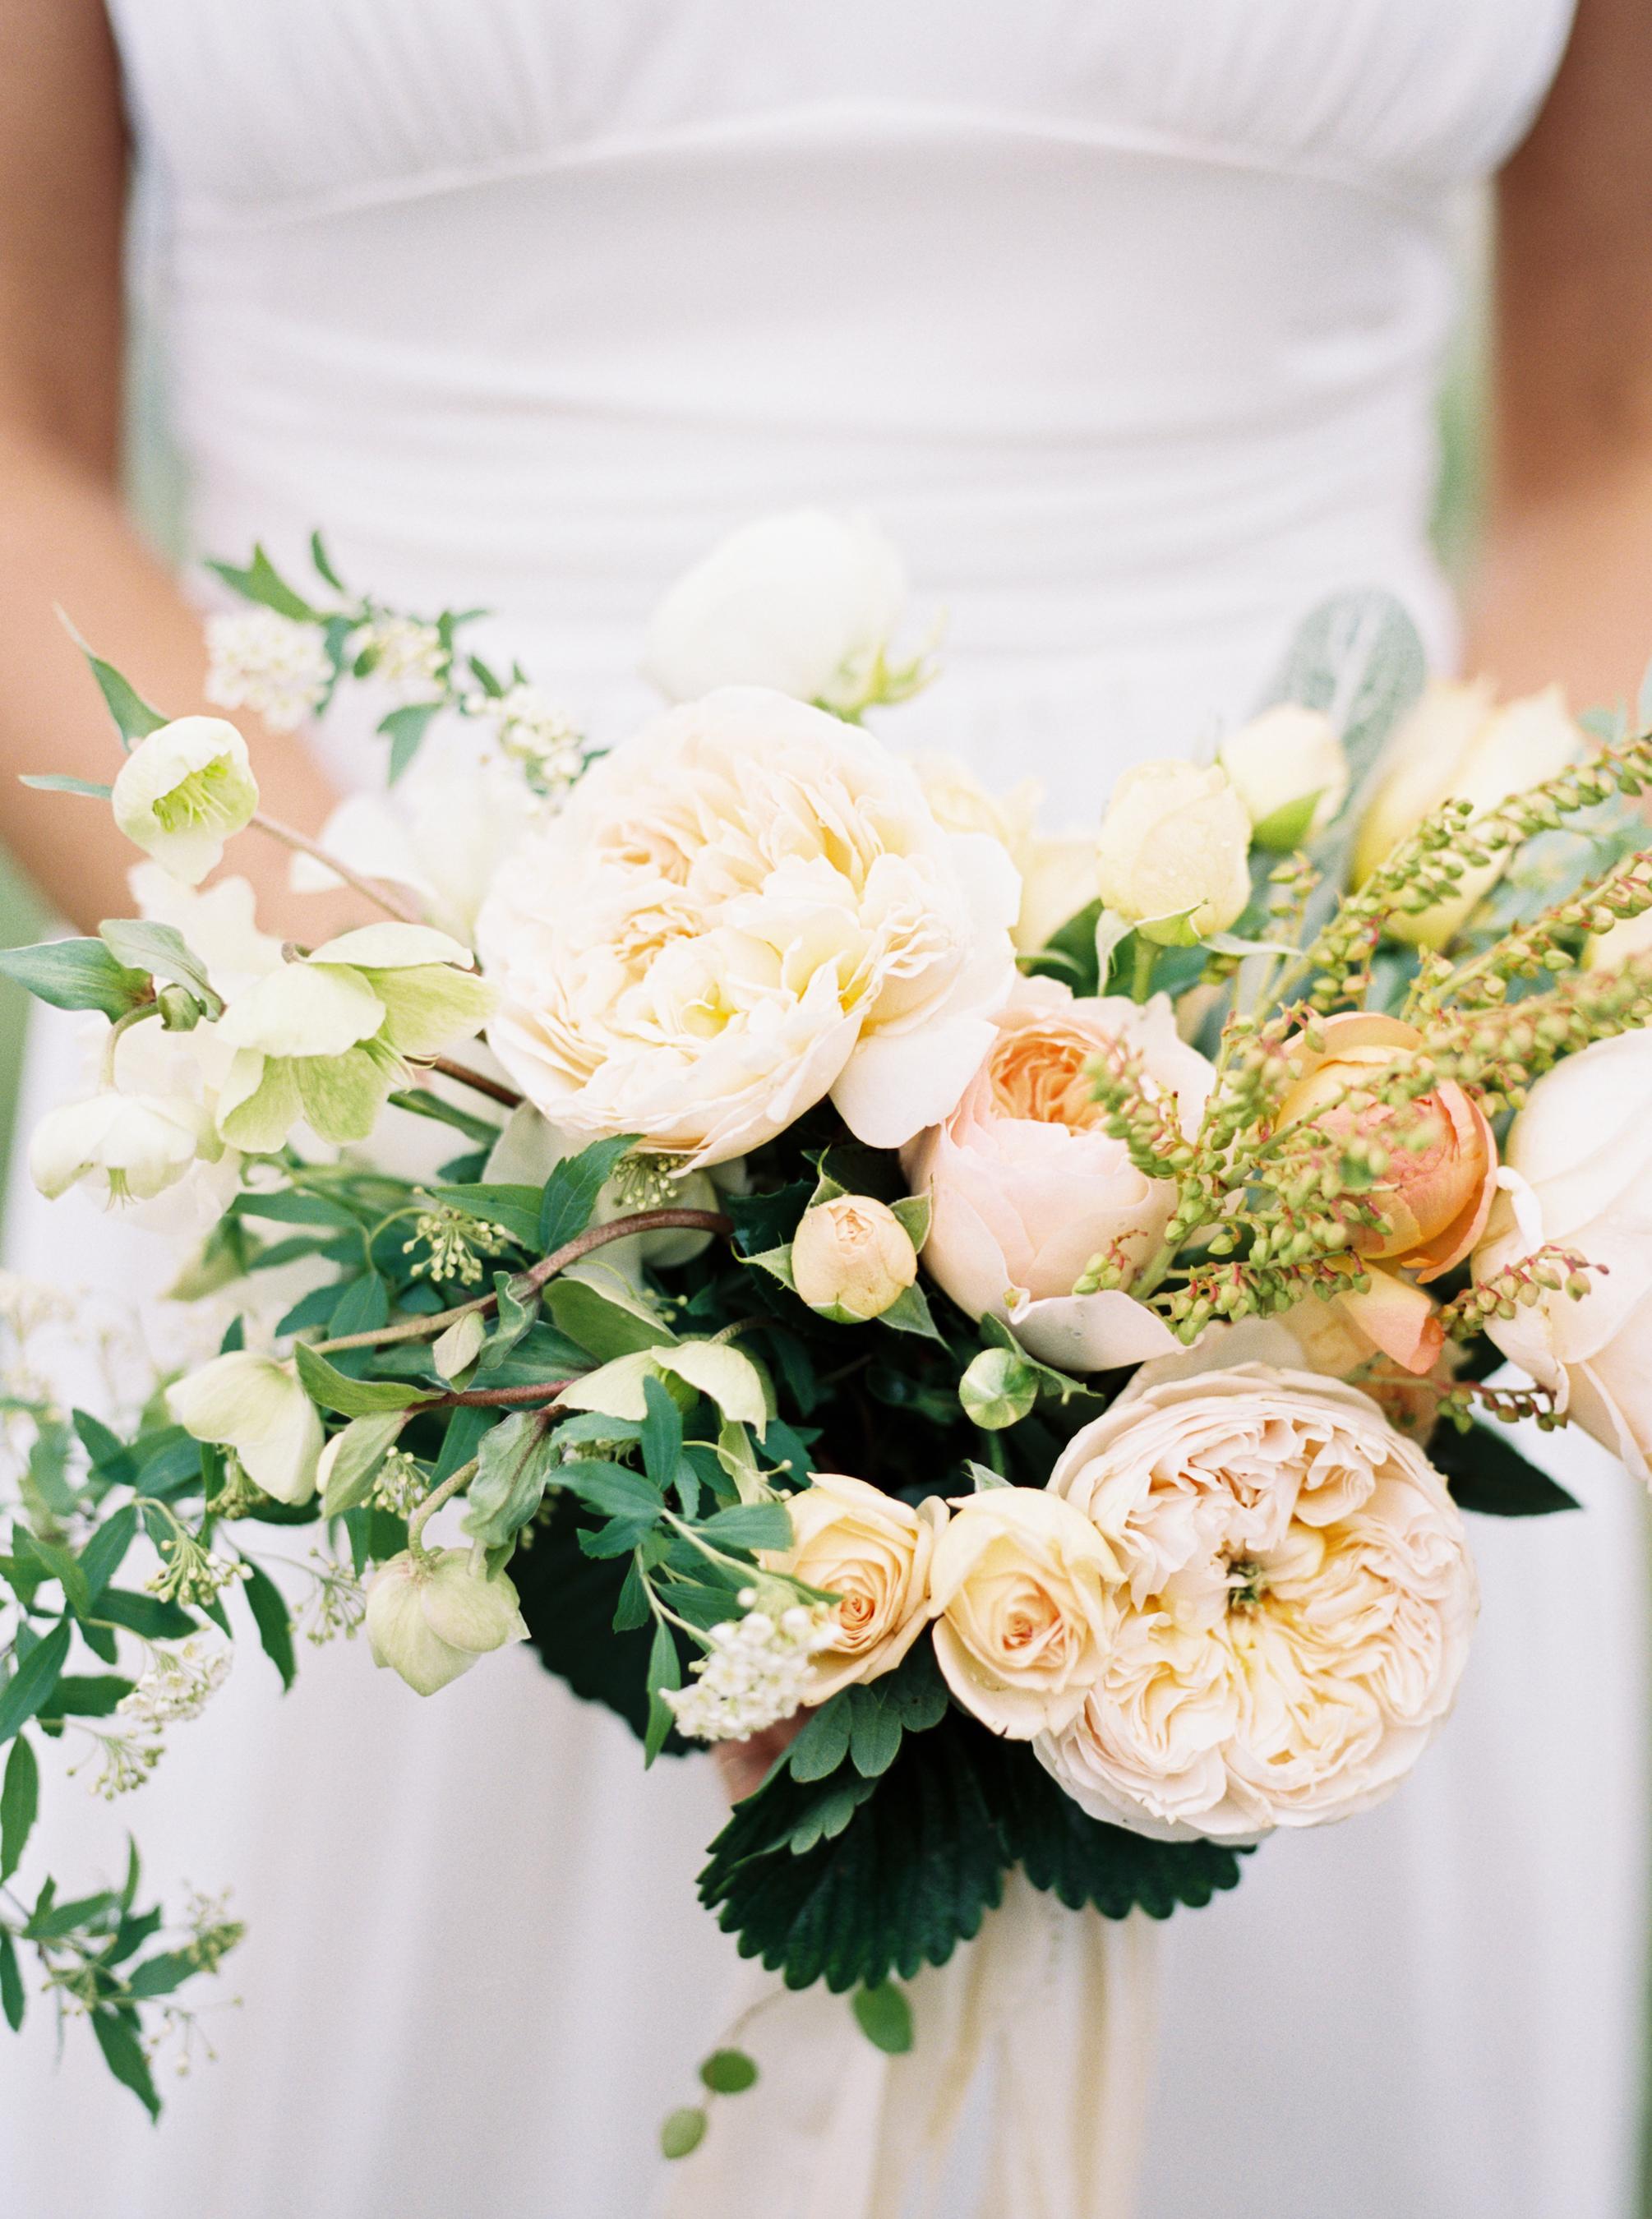 Danford-Photography-Bozeman-Montana-California-Wedding-Engagement-Photographer-43.jpg